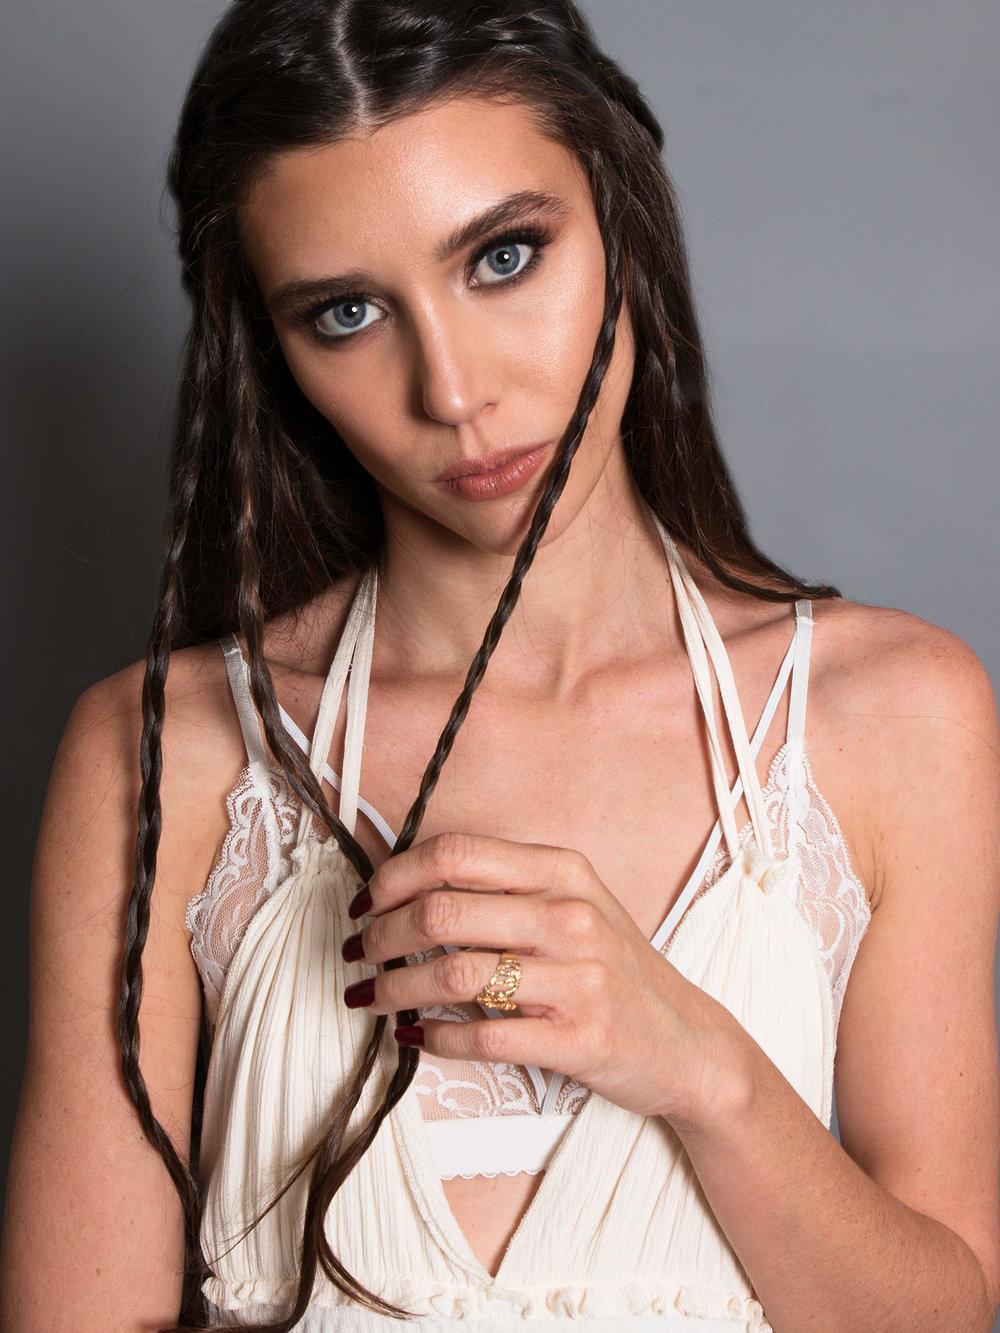 amora_beauty_studio_female_model_makeup_headshot_miami.jpg